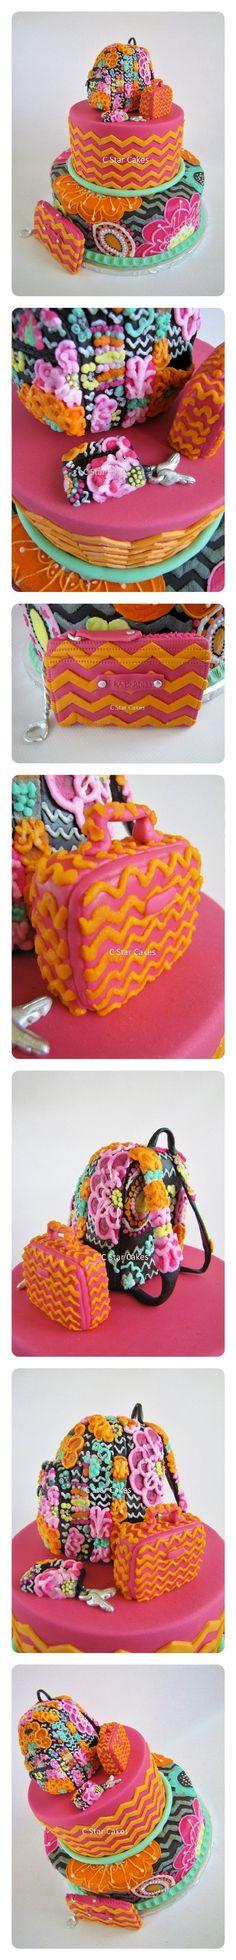 Vera Bradley Ziggy Zinnia cake by C Star Cakes - handbags, pink, michael kors, dooney bourke, country, marc jacobs purse *ad